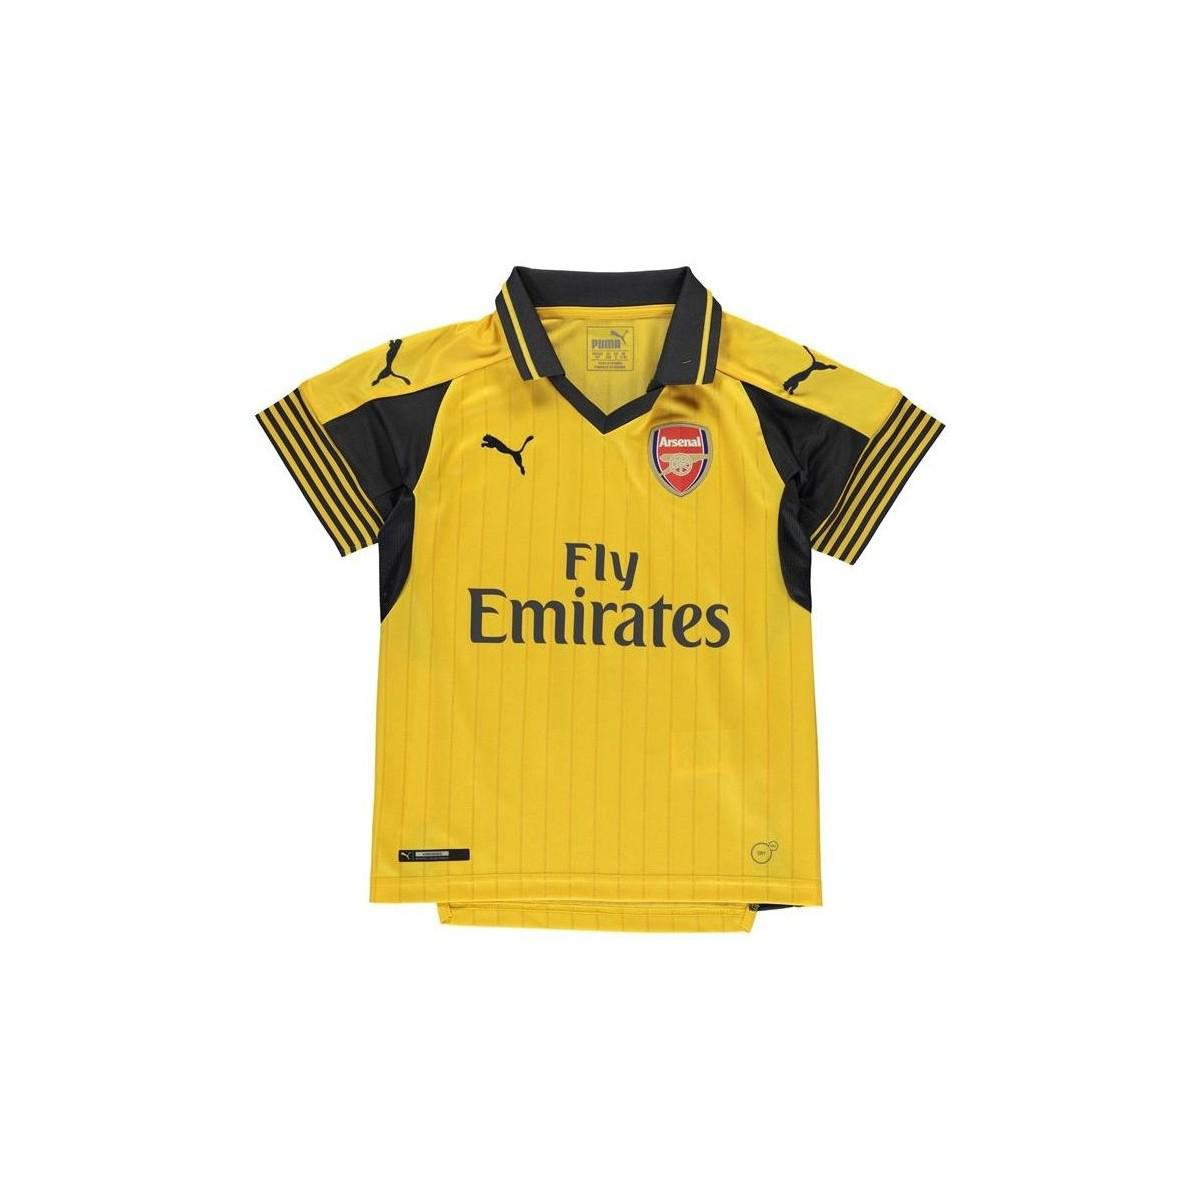 be07b356f34ec1 PUMA 2016-17 Arsenal Away Shirt (ozil 11) - Kids Men s T Shirt In ...